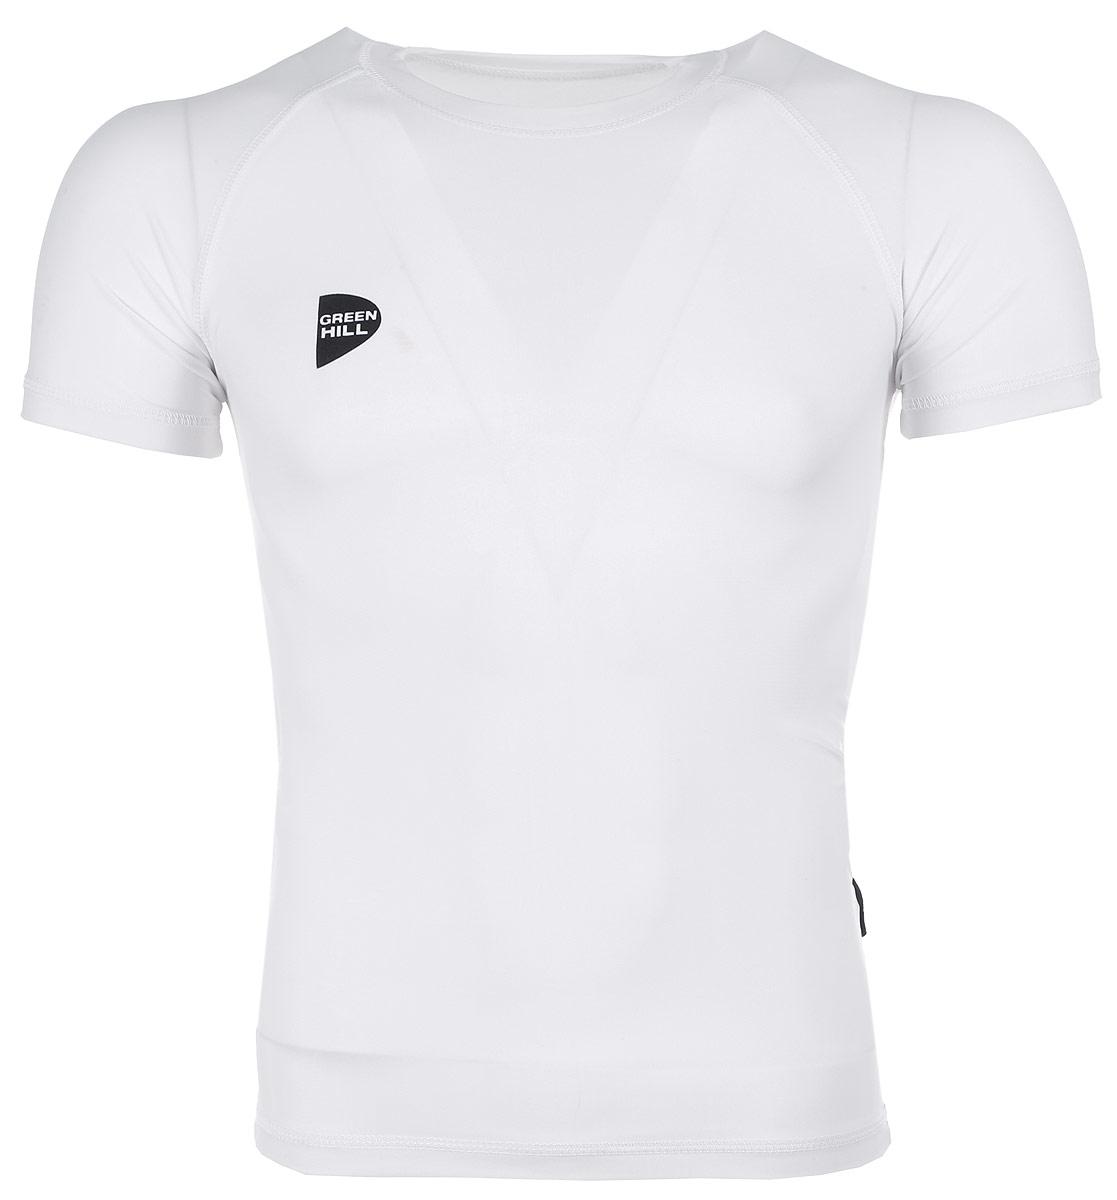 Защитная футболка Green Hill, цвет: белый. Размер S. RGS-3558fRGS-3558fЗащитная футболка с длинным рукавом. Материал: полиэстер/лайкра. Размеры: Длина 62 см ширина 39,5 см длина рукава от шейного шва 64,5 см